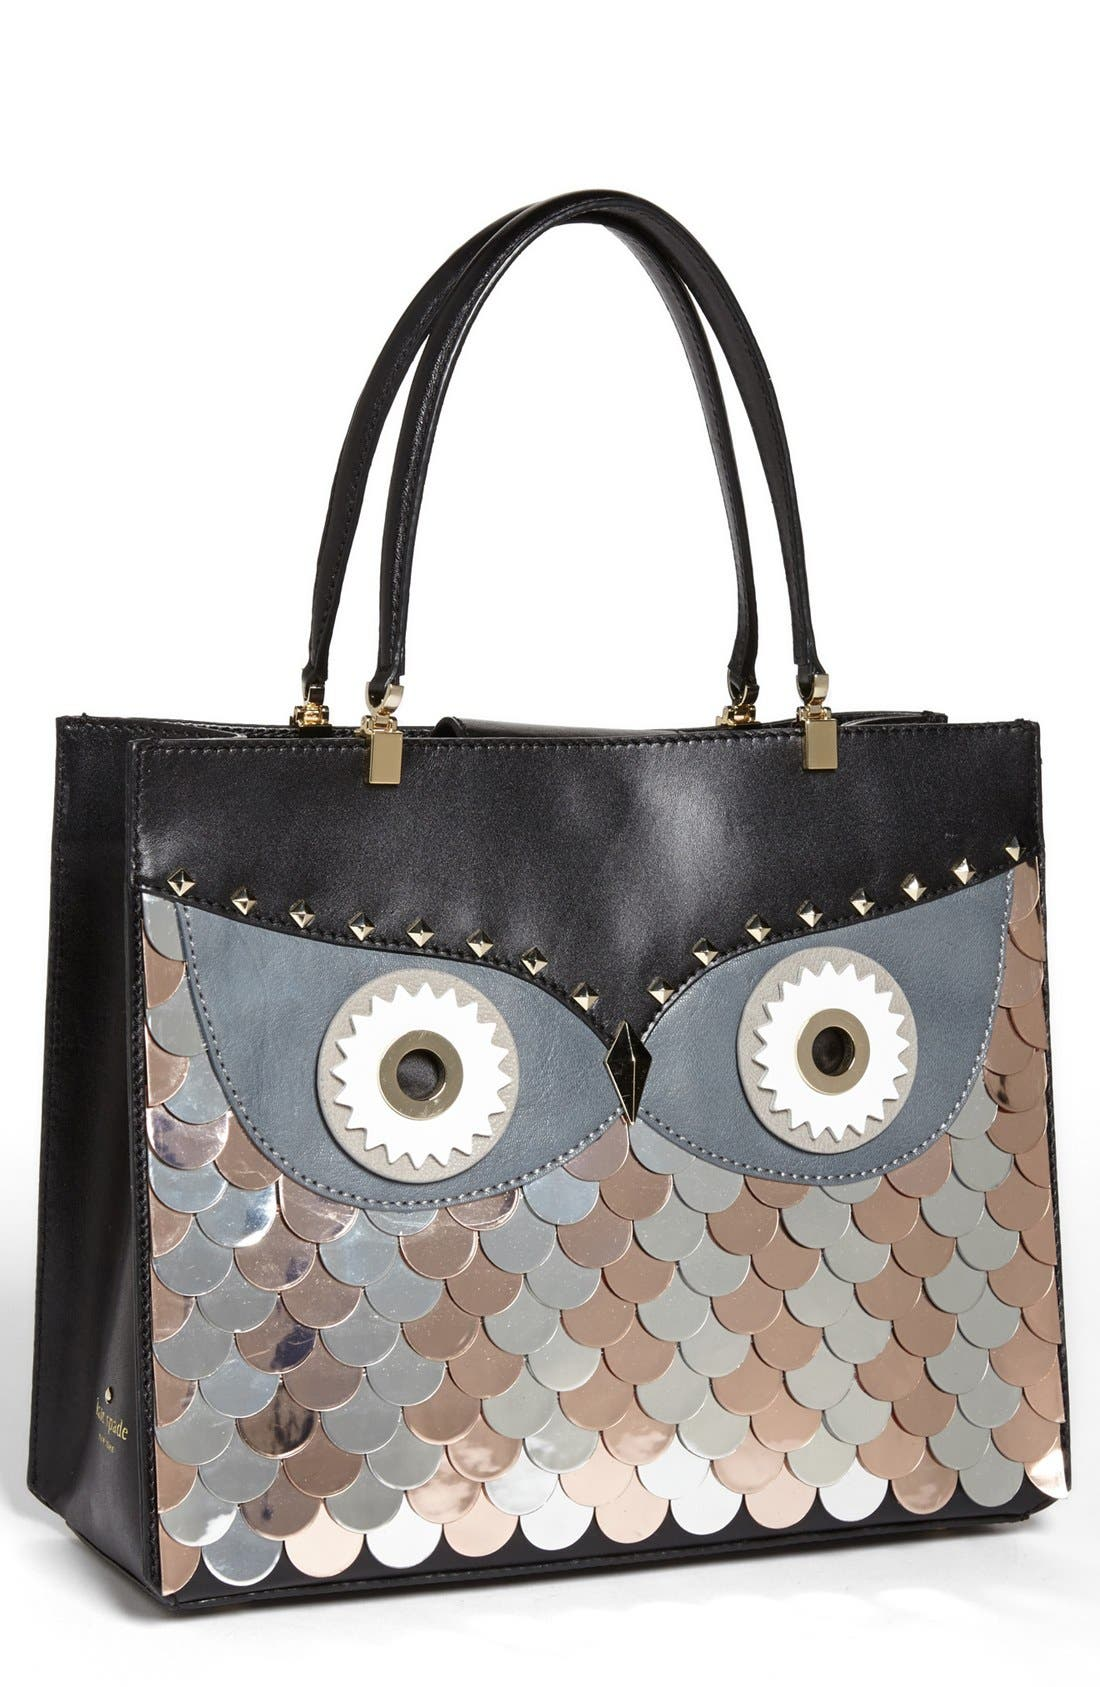 Main Image - kate spade new york 'wise owl quinn' tote, medium